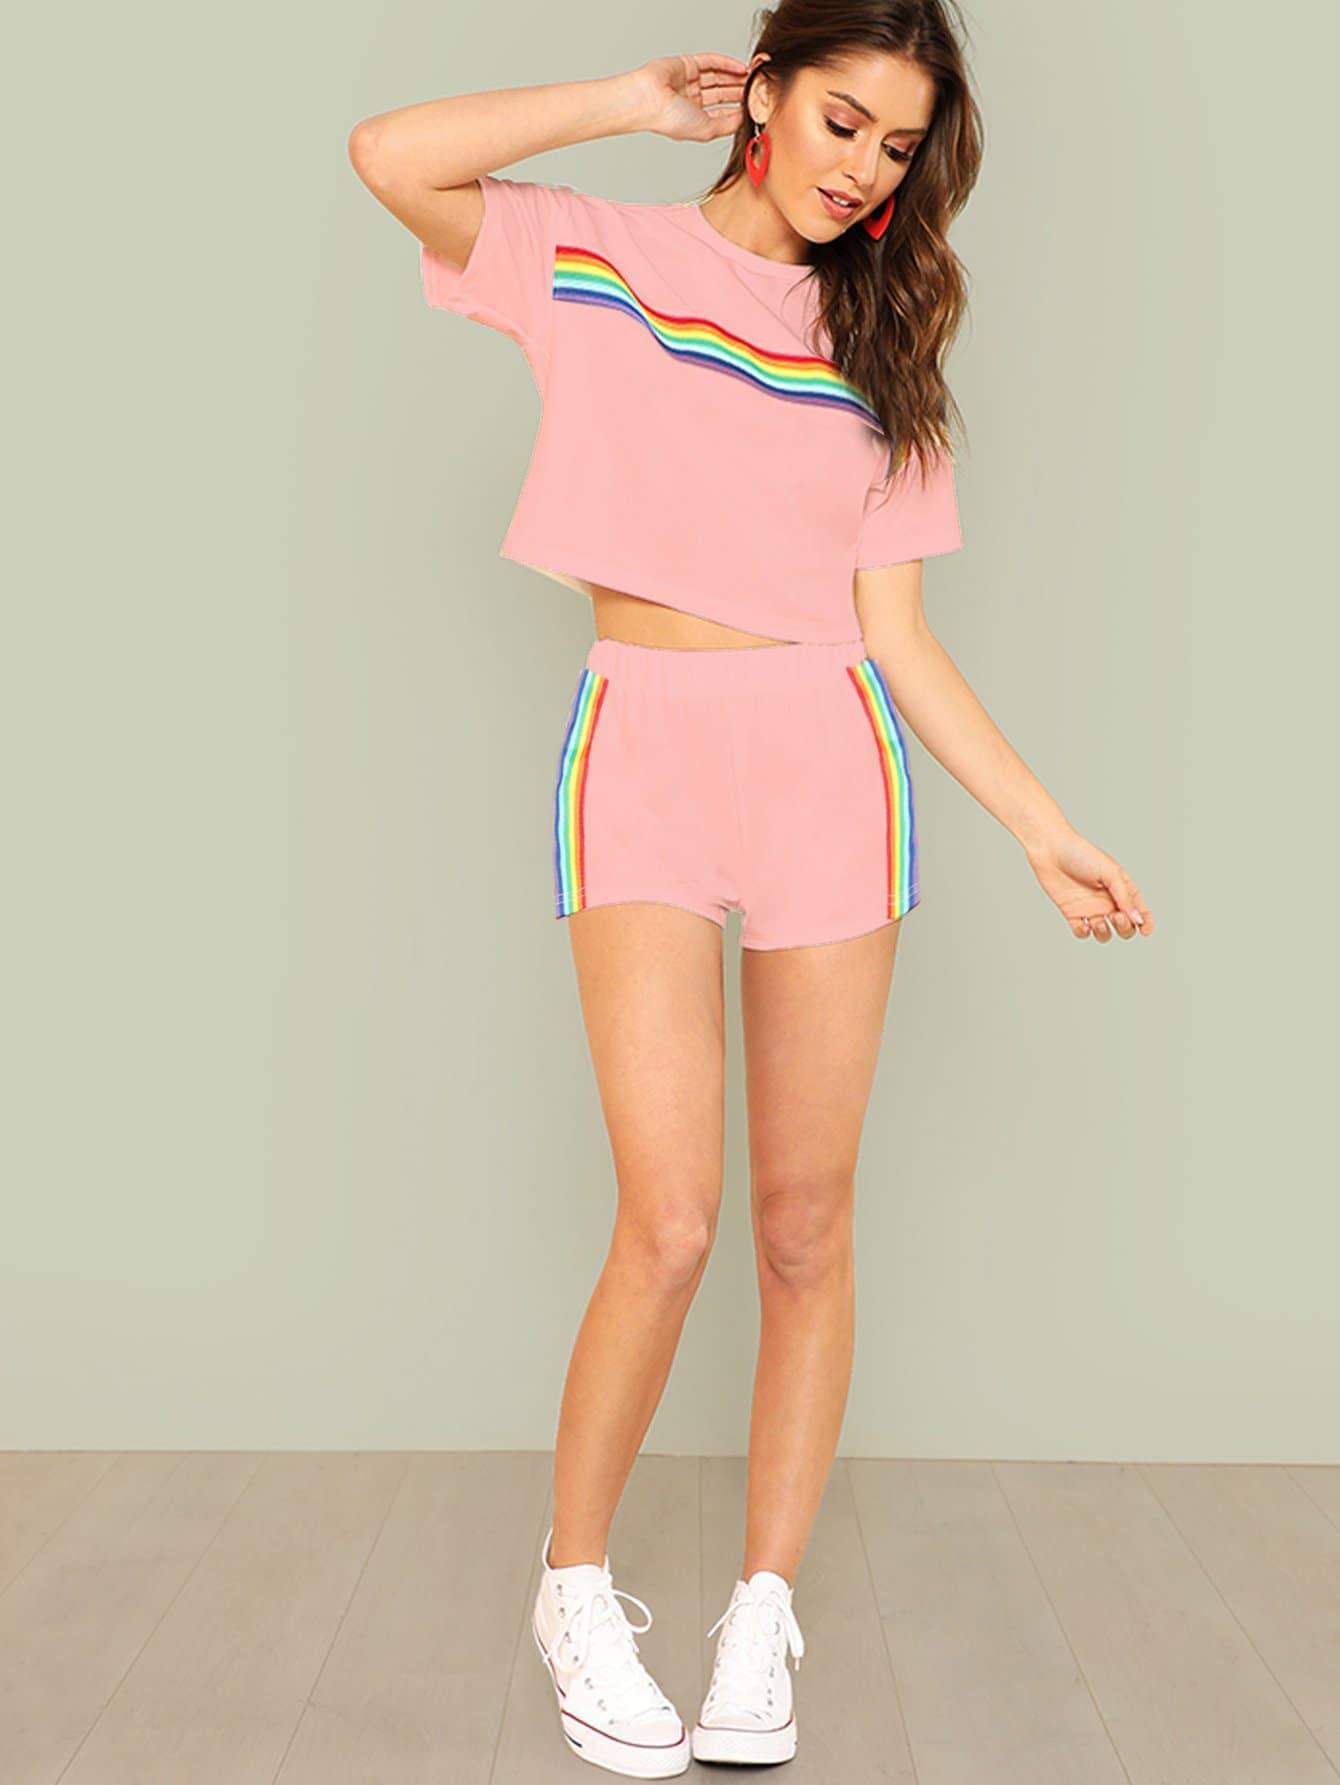 Rainbow Striped Crop Top & Shorts Set black choker sleeveless crop top